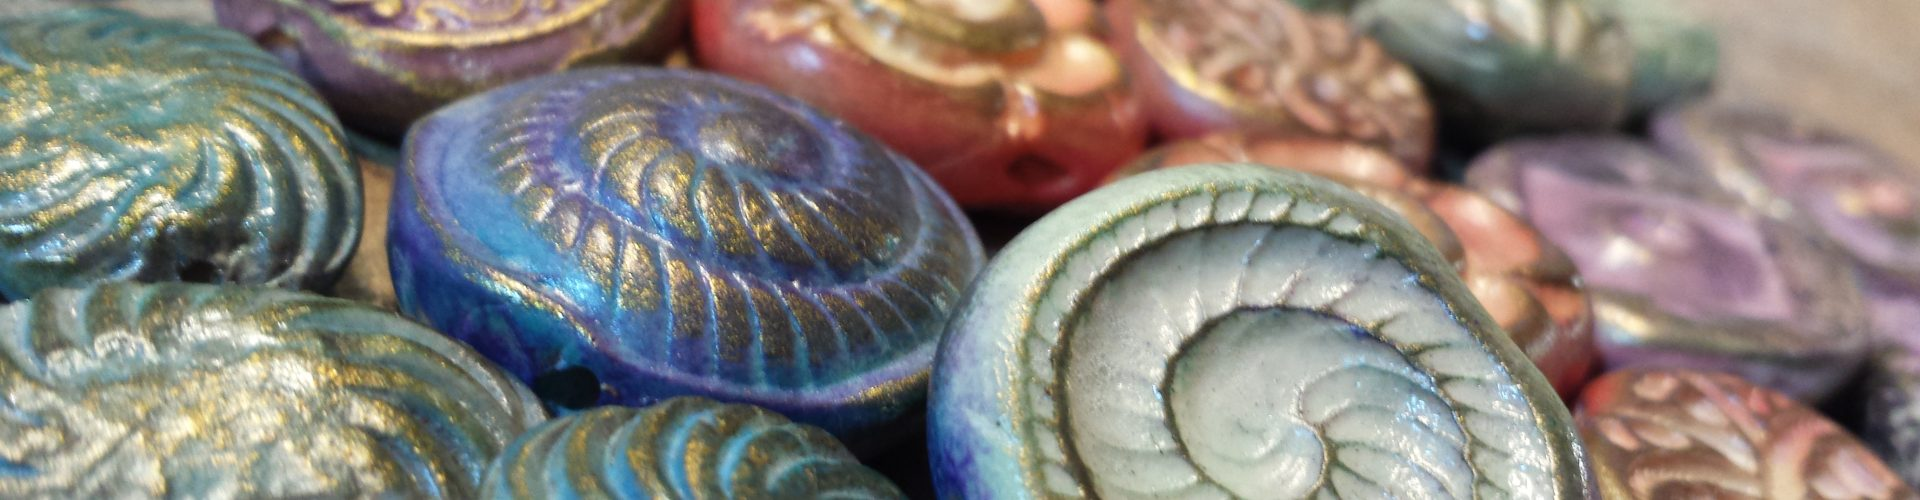 Making Rustic / Organic Polymer Clay Beads